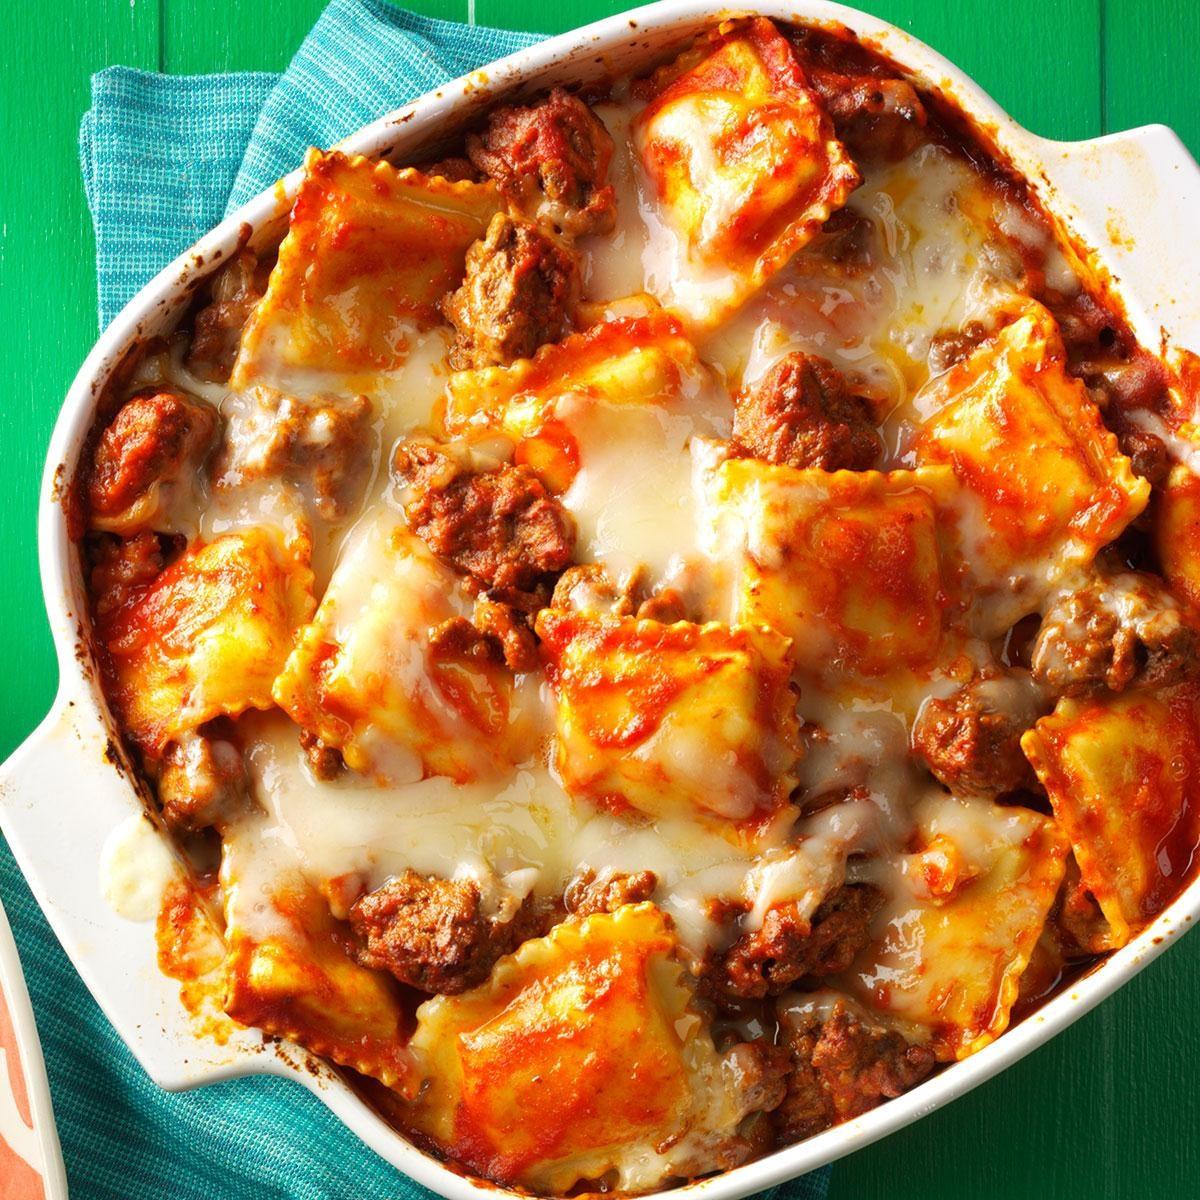 Ravioli Lasagna Recipe | Taste of Home